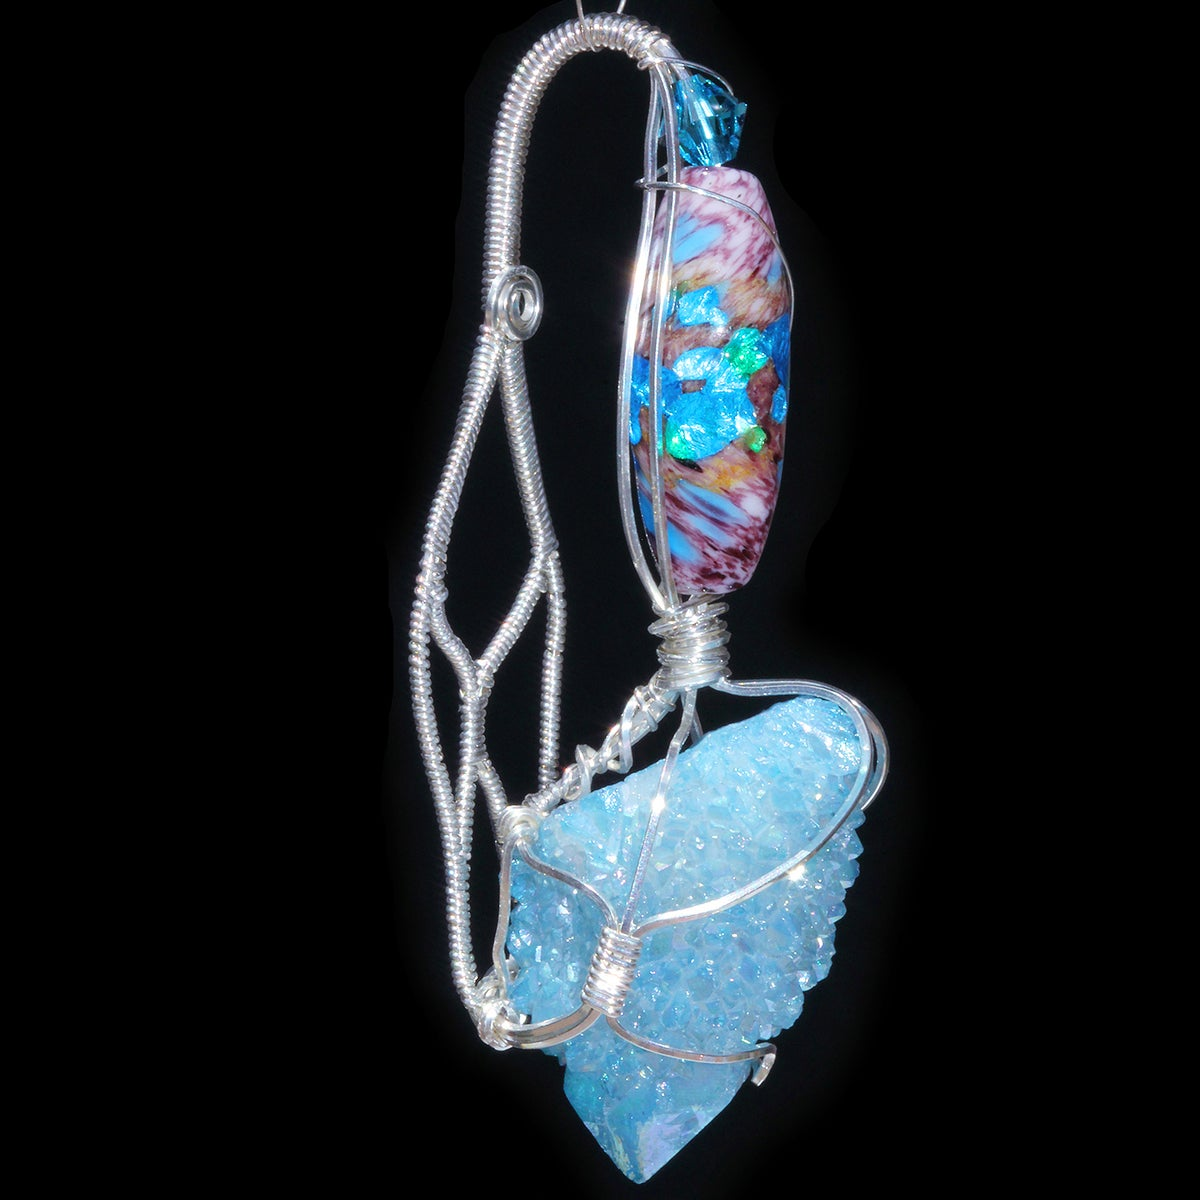 Aqua Aura Spirit Quartz Crystal Handmade Pendant with Opalescent Foil Bead